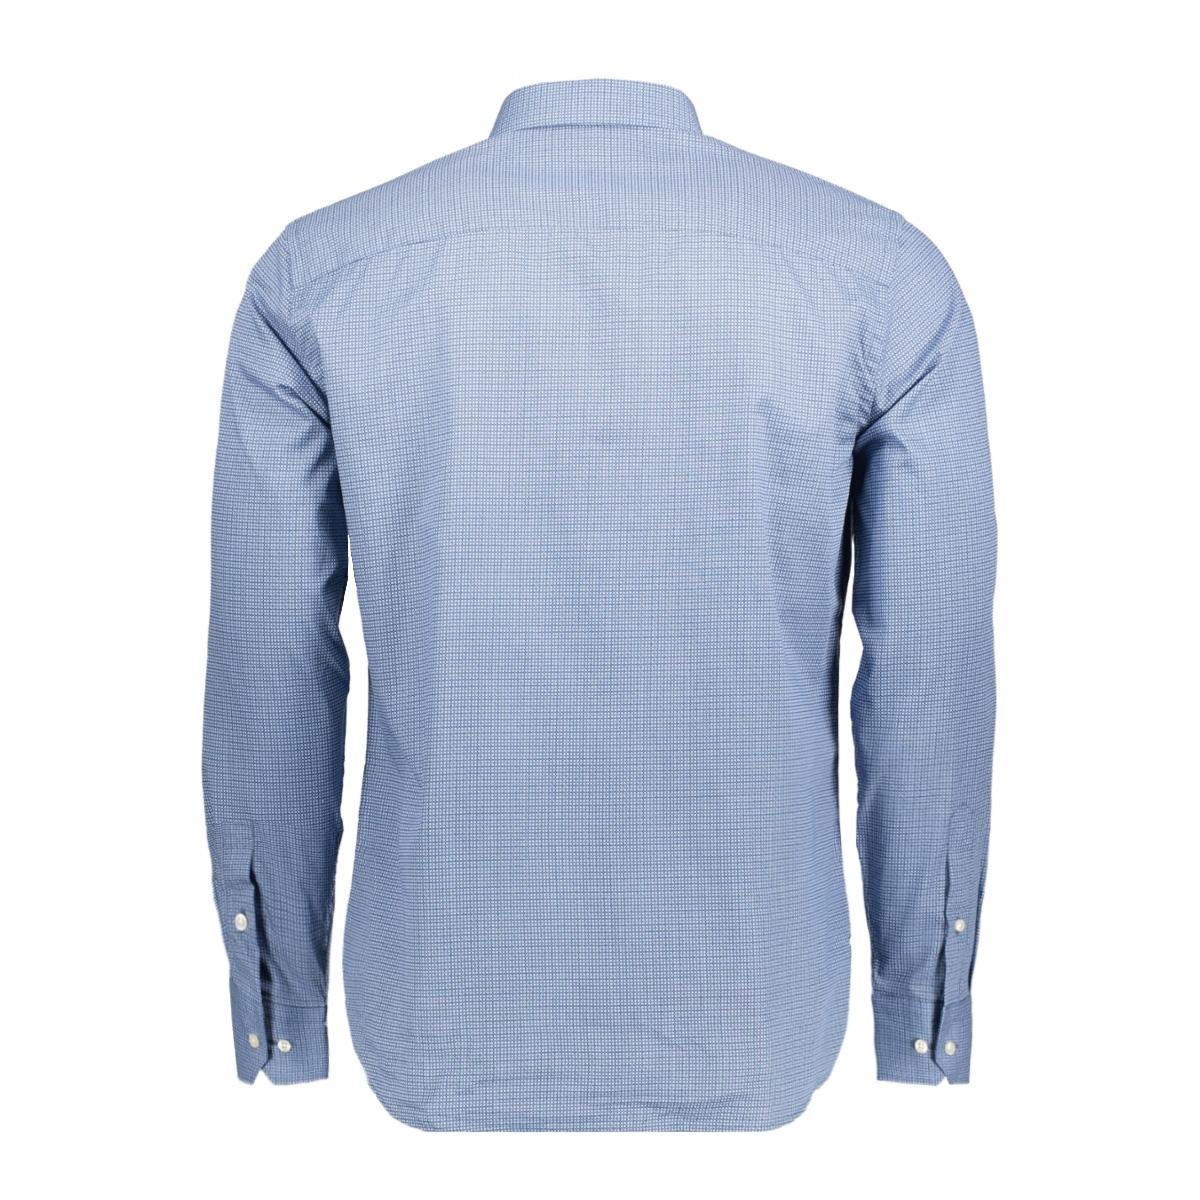 jprjose shirt l/s plain 12122830 jack & jones overhemd true navy